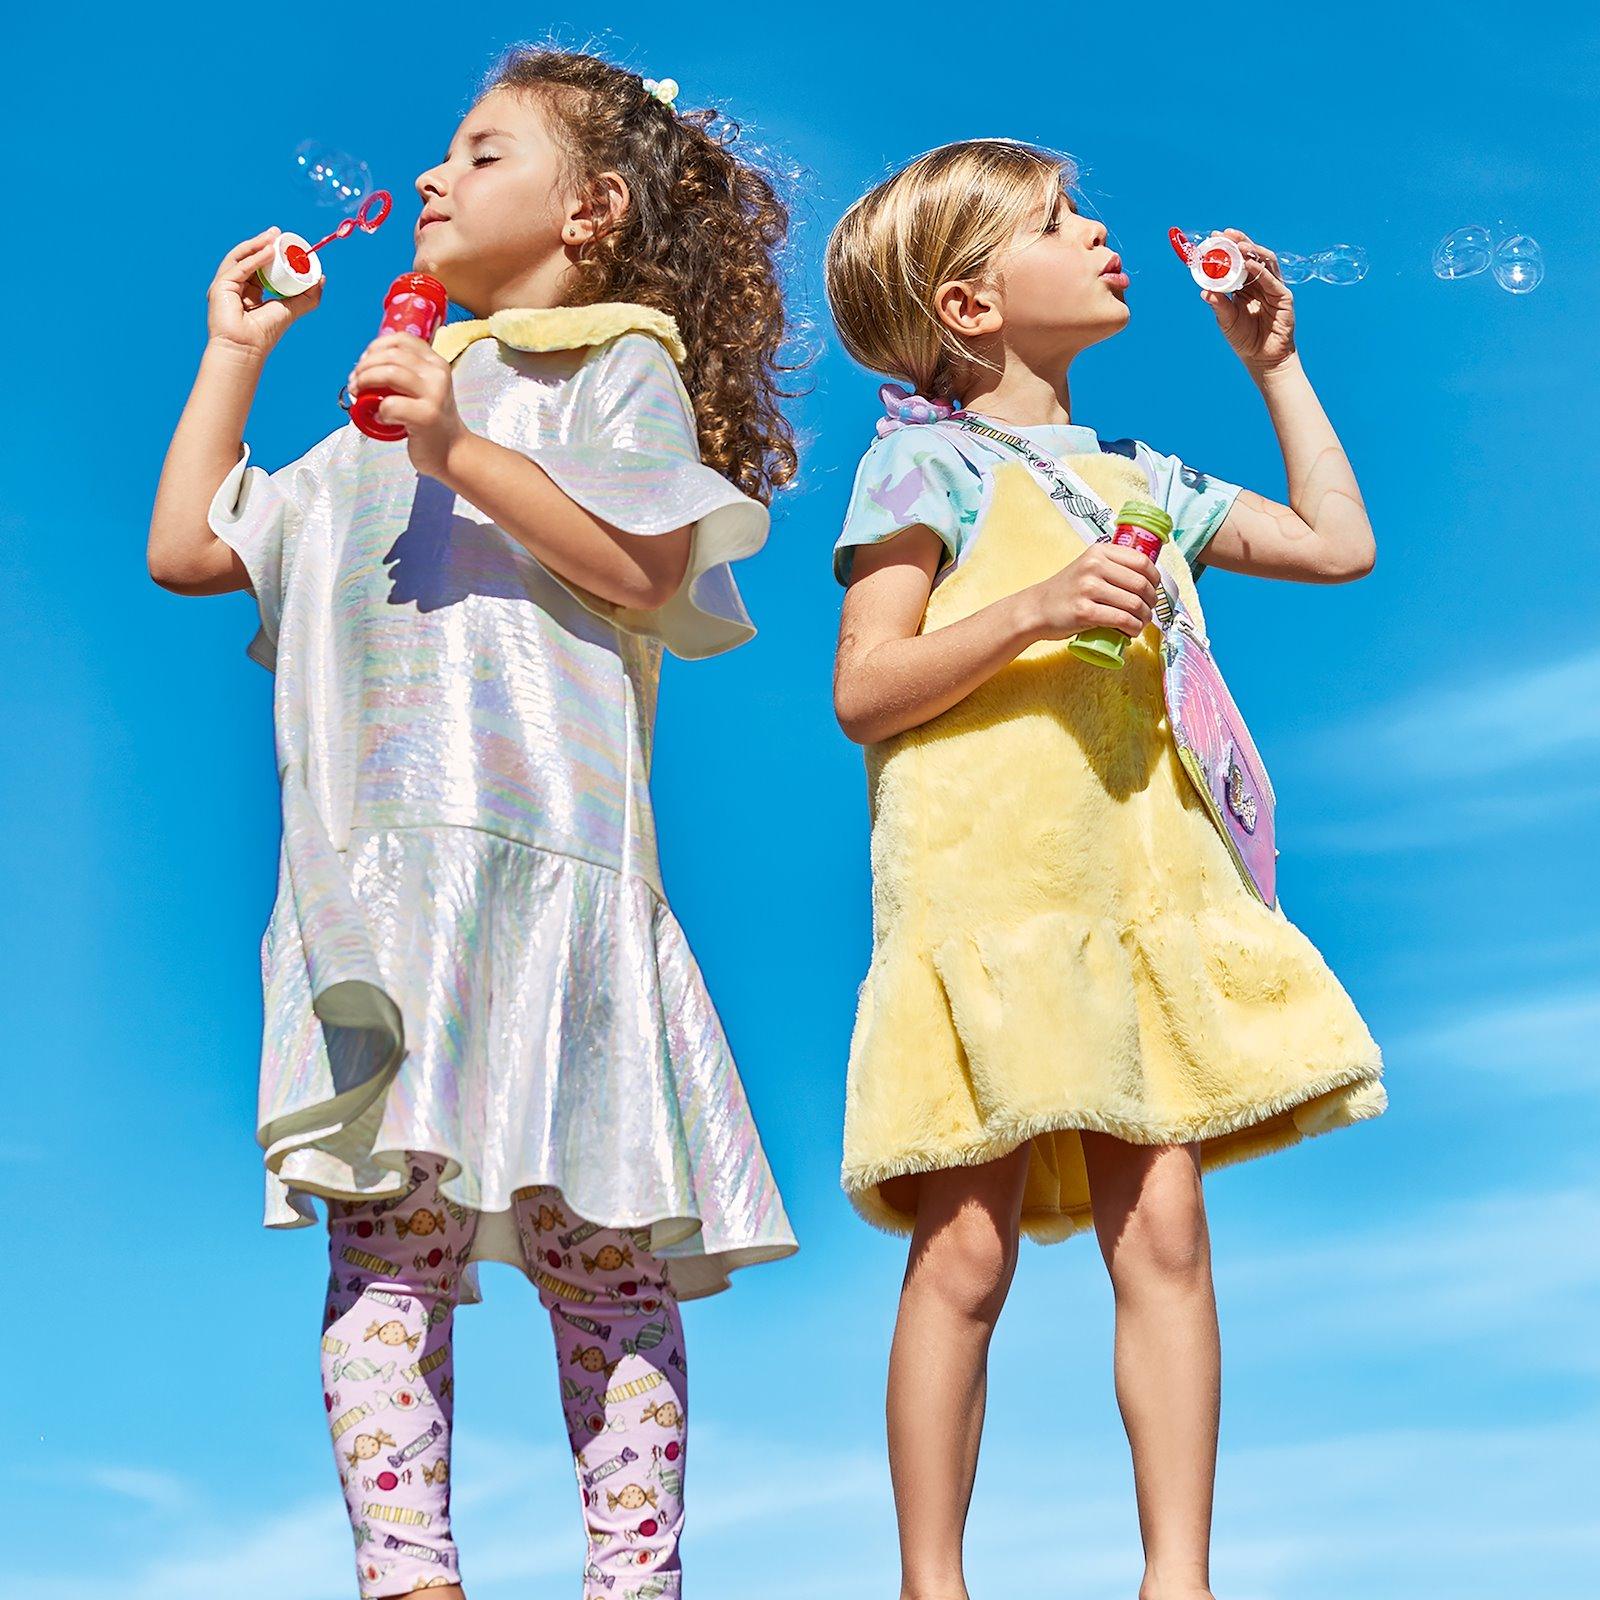 Patch candy 36x70mm yell/purpl 1pc p65021_272678_p63062_910283_p90328_824045_82409_26523_bundle